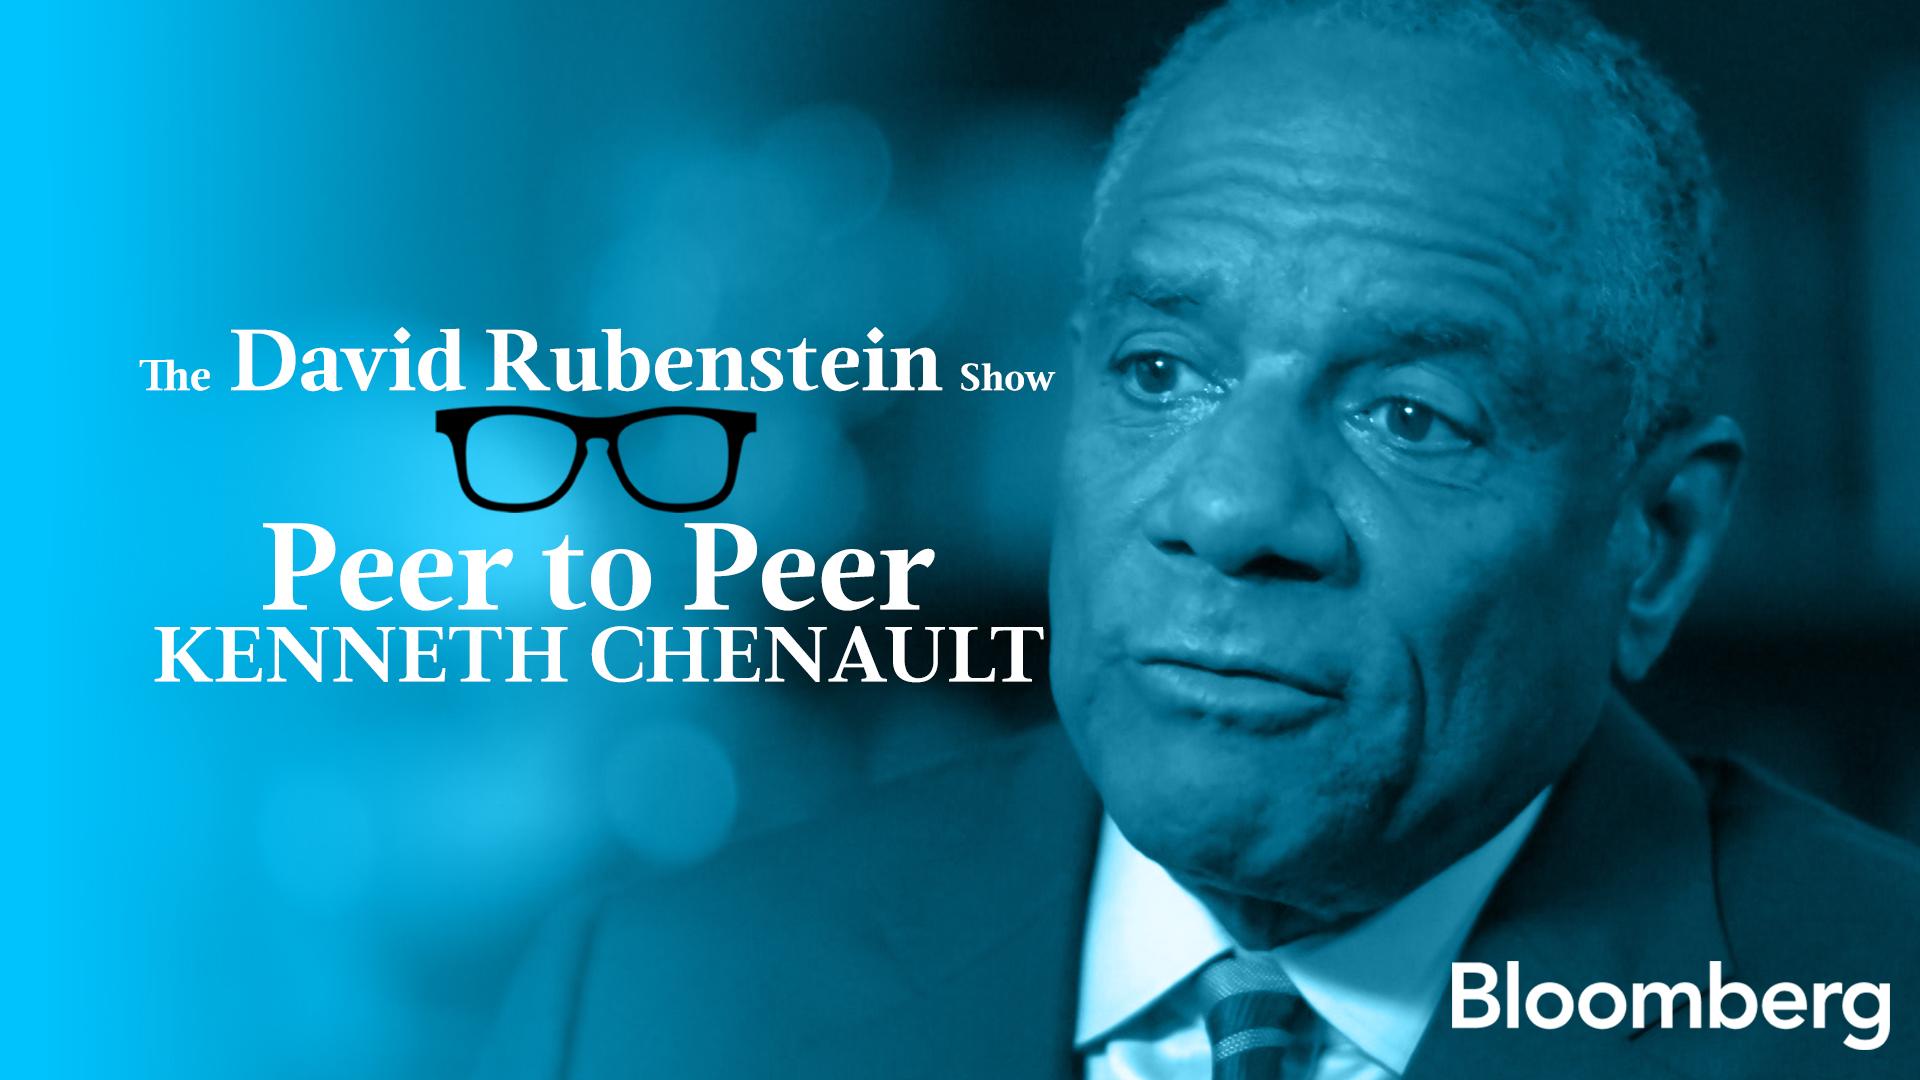 Kenneth Chenault Peer to Peer: The David Rubenstein Show - Bloomberg